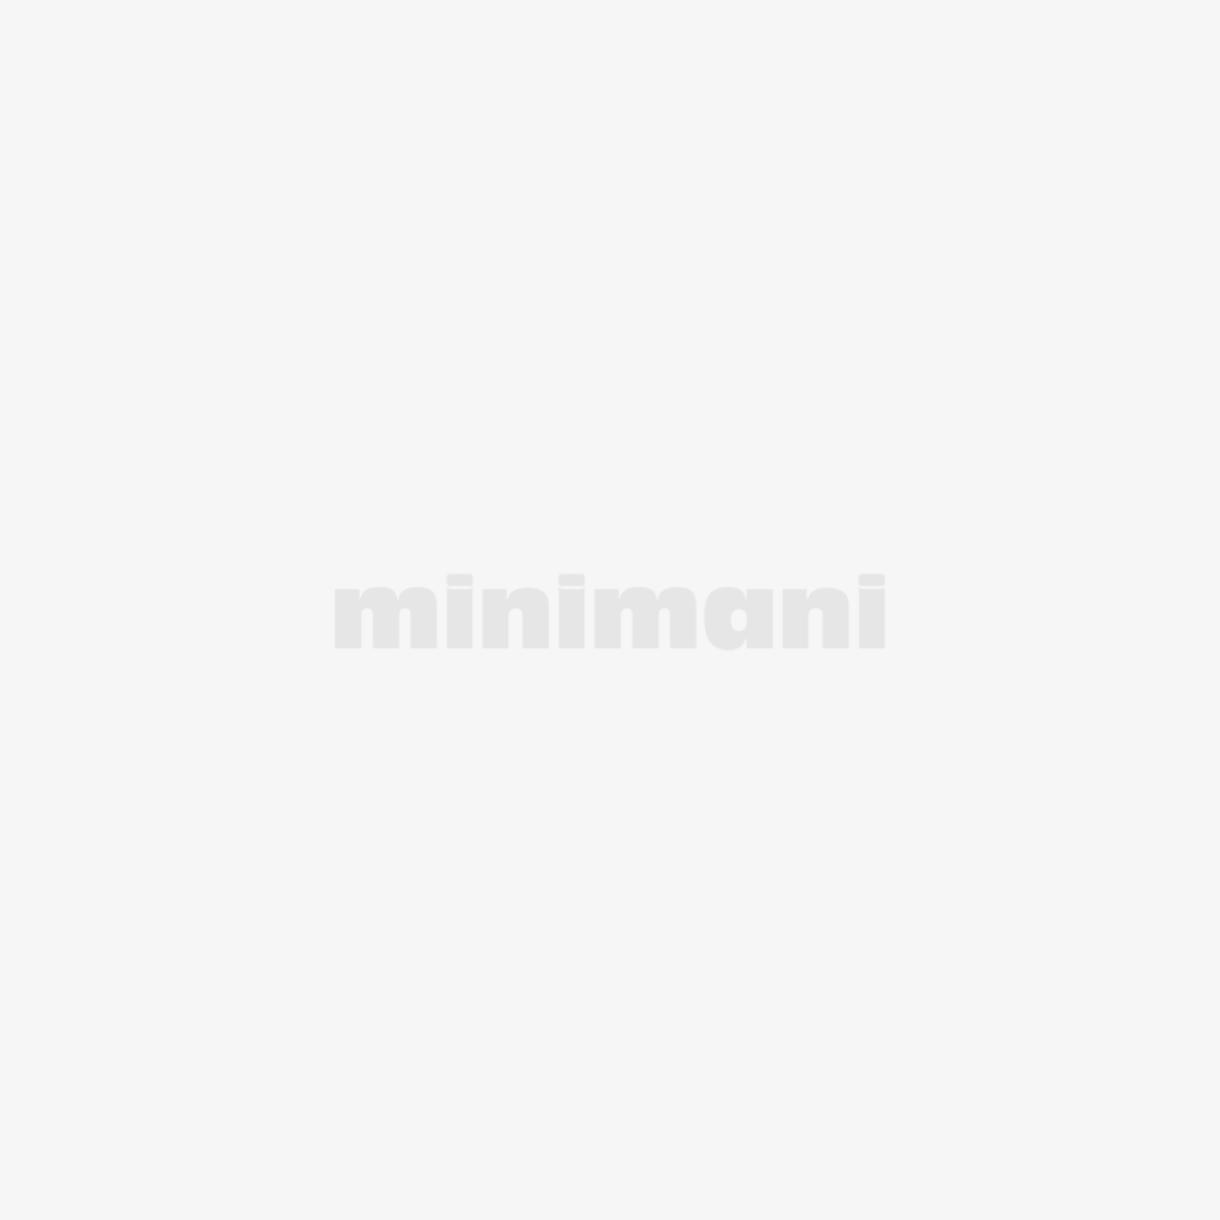 STANLEY YLEISLIIMAPUIKKO 1-GS240-24, KIRKAS, 11.3mmx101mm (x